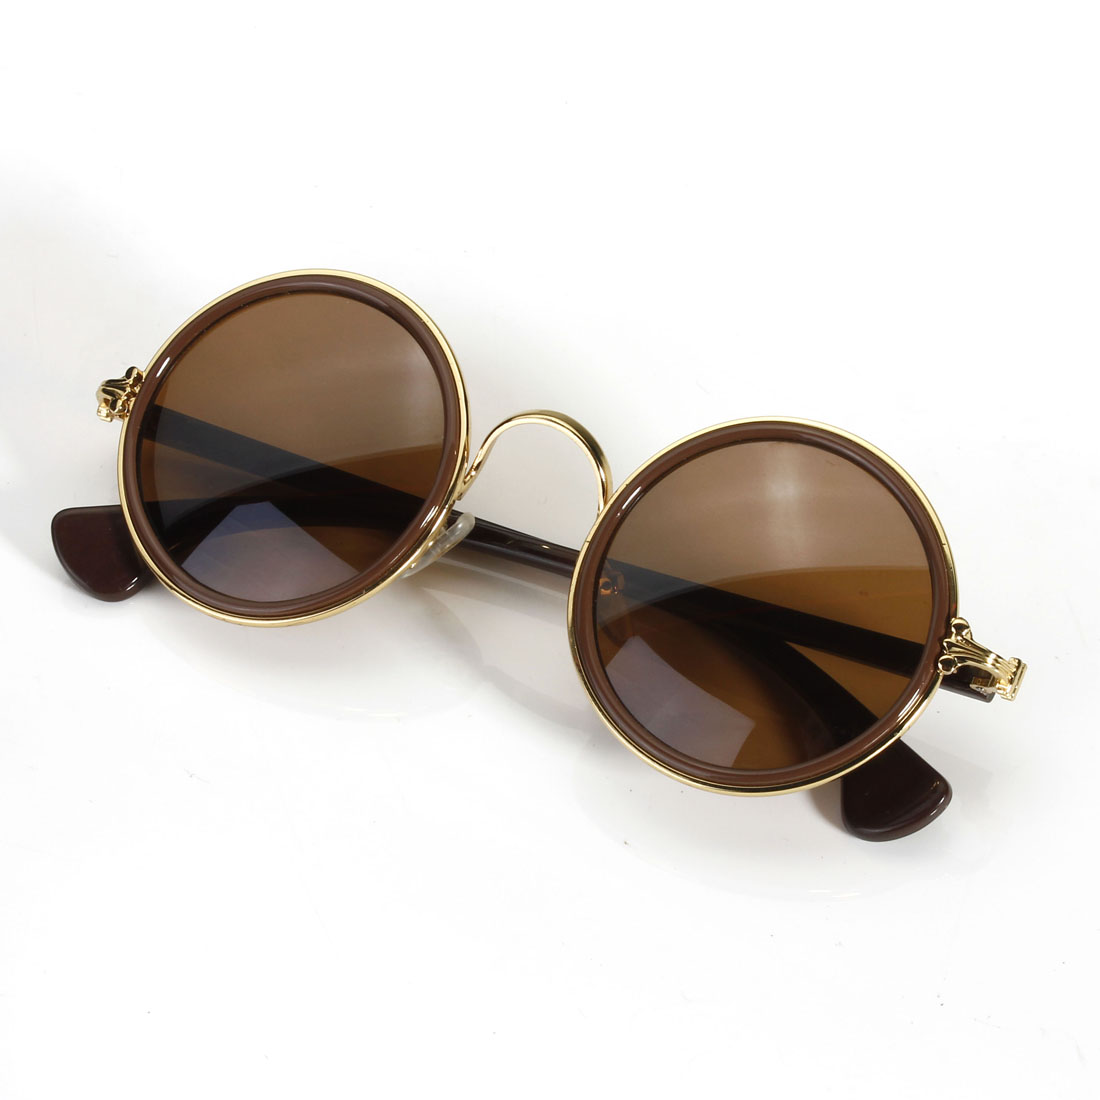 Tondi occhiali da sole sunglasses vintage retro rotondi for Occhiali tondi da vista vintage